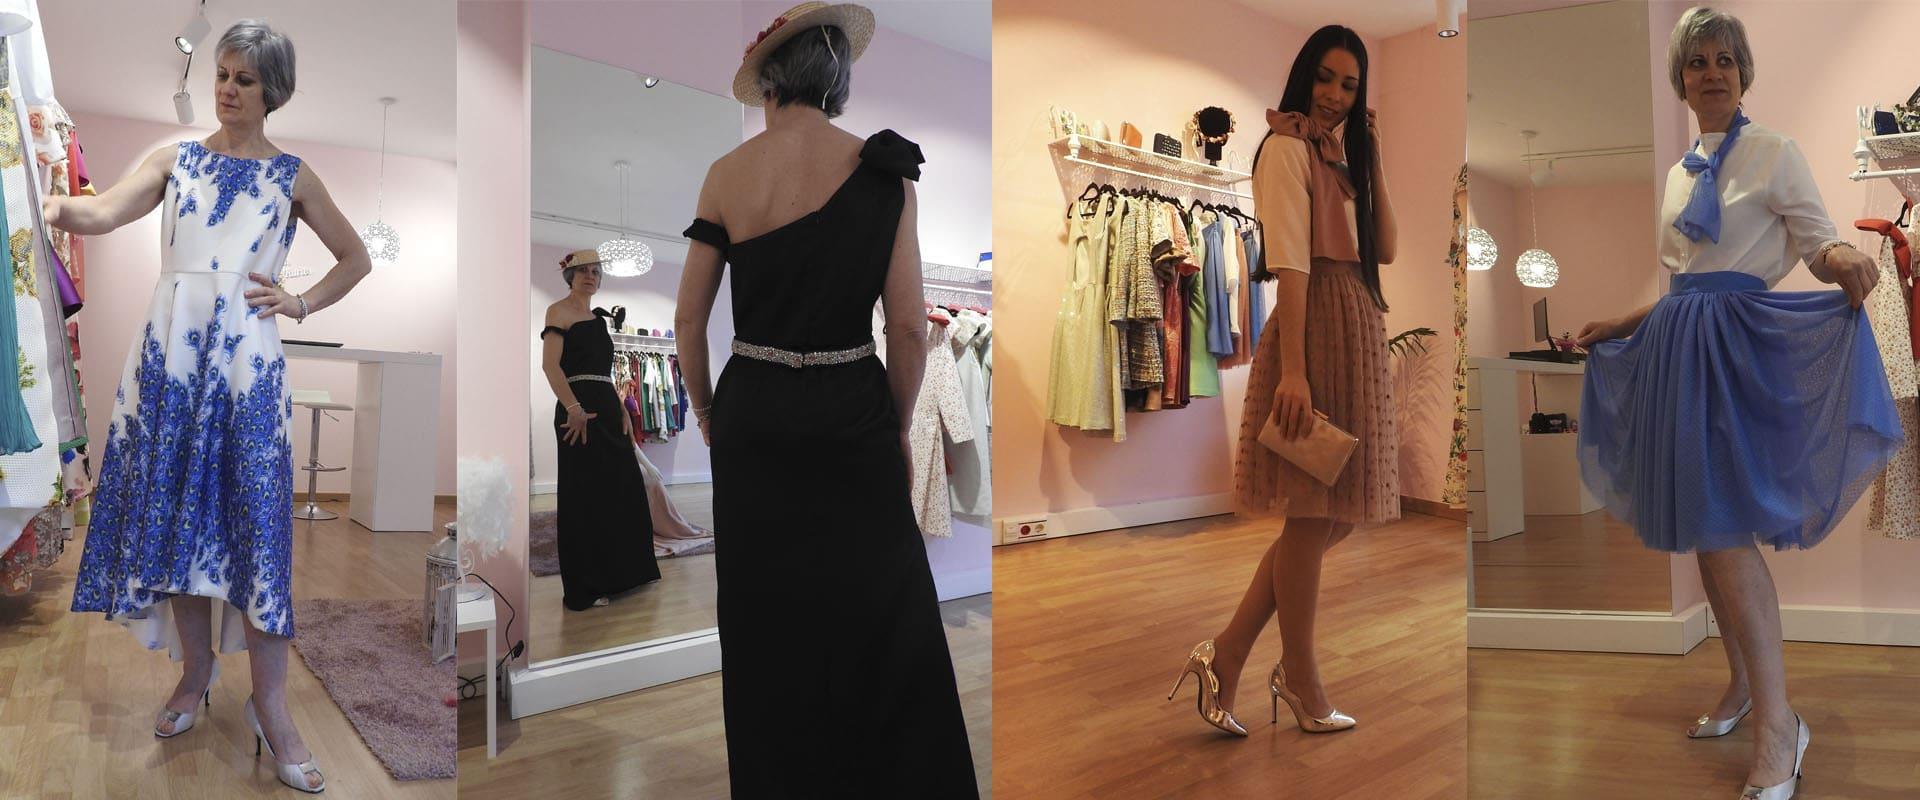 portada vestido plumas,negro y tul1